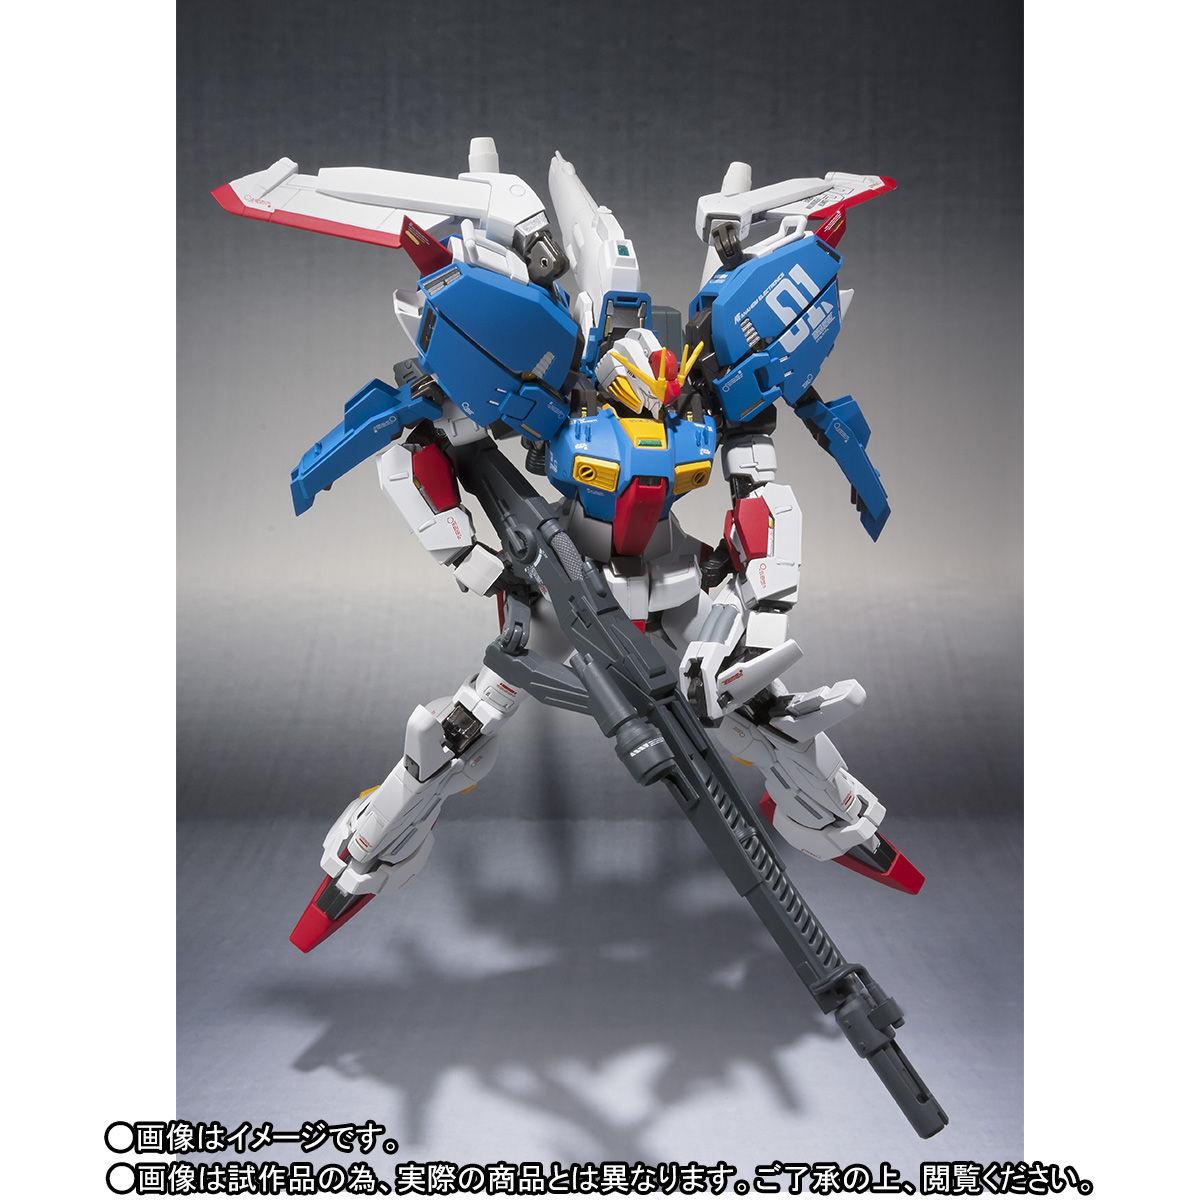 METAL ROBOT魂(Ka signature)〈SIDE MS〉『Sガンダム』可動フィギュア-002